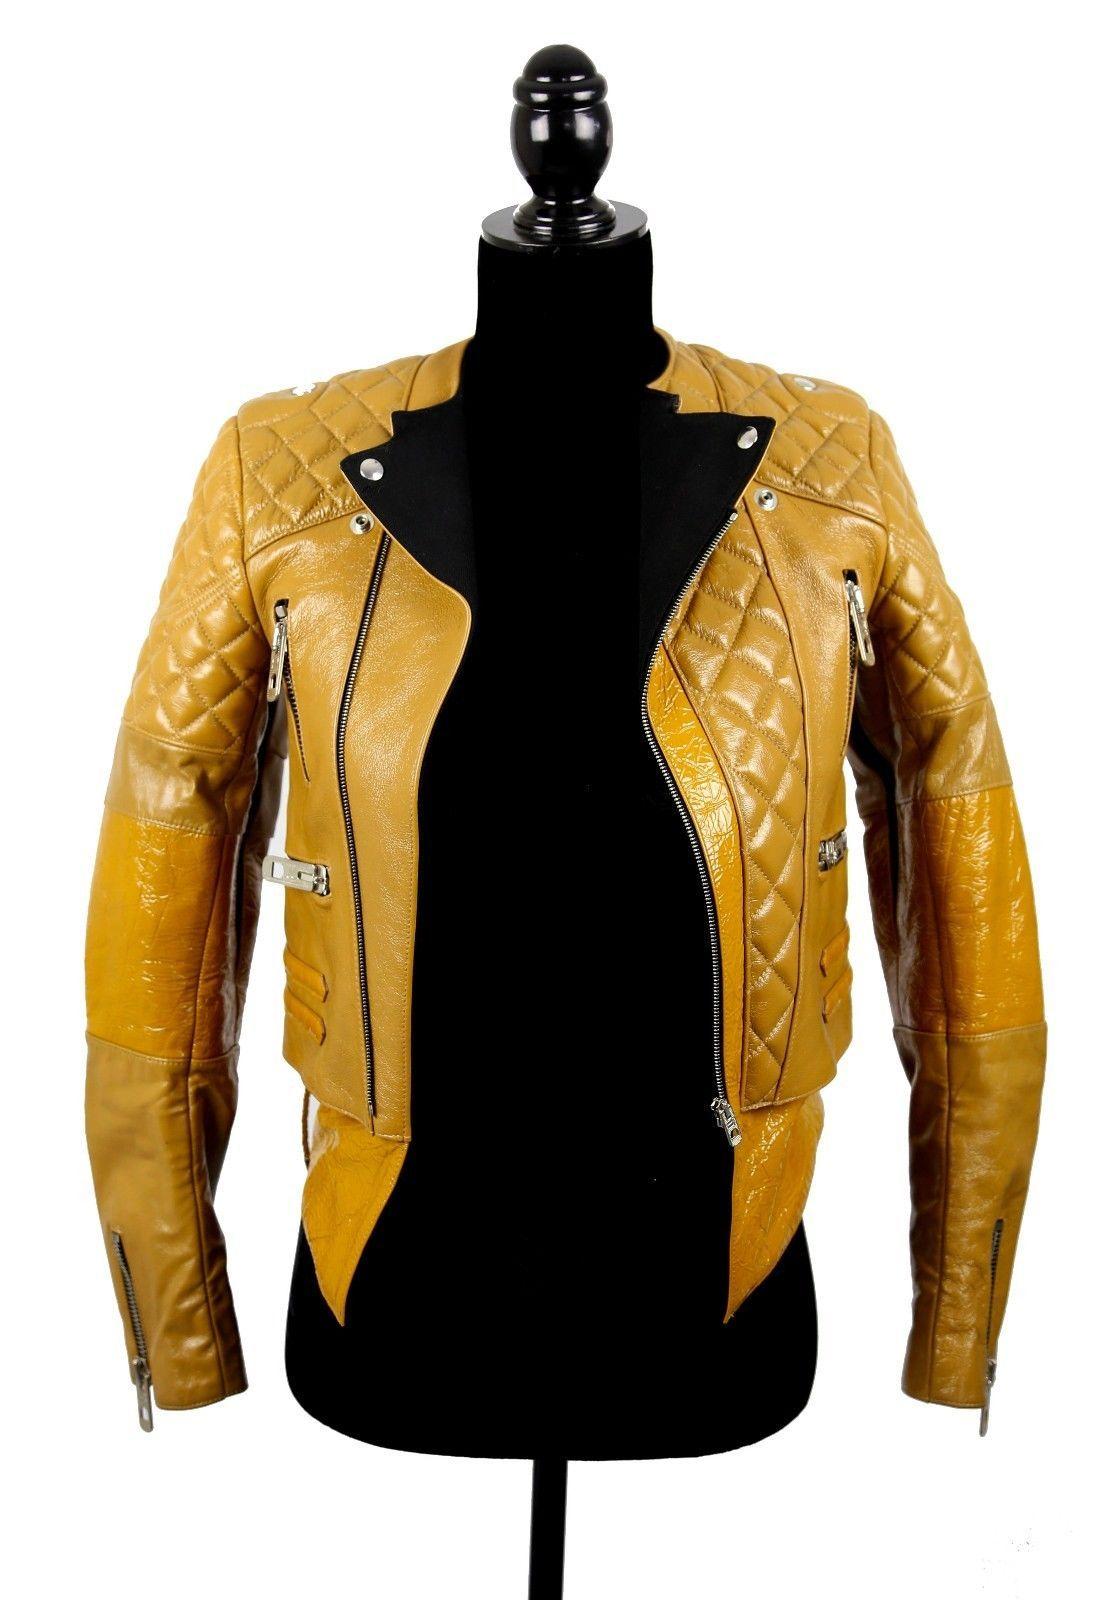 Balenciaga Caramel/Brown Leather Zip Up Moto Jacket Size:36